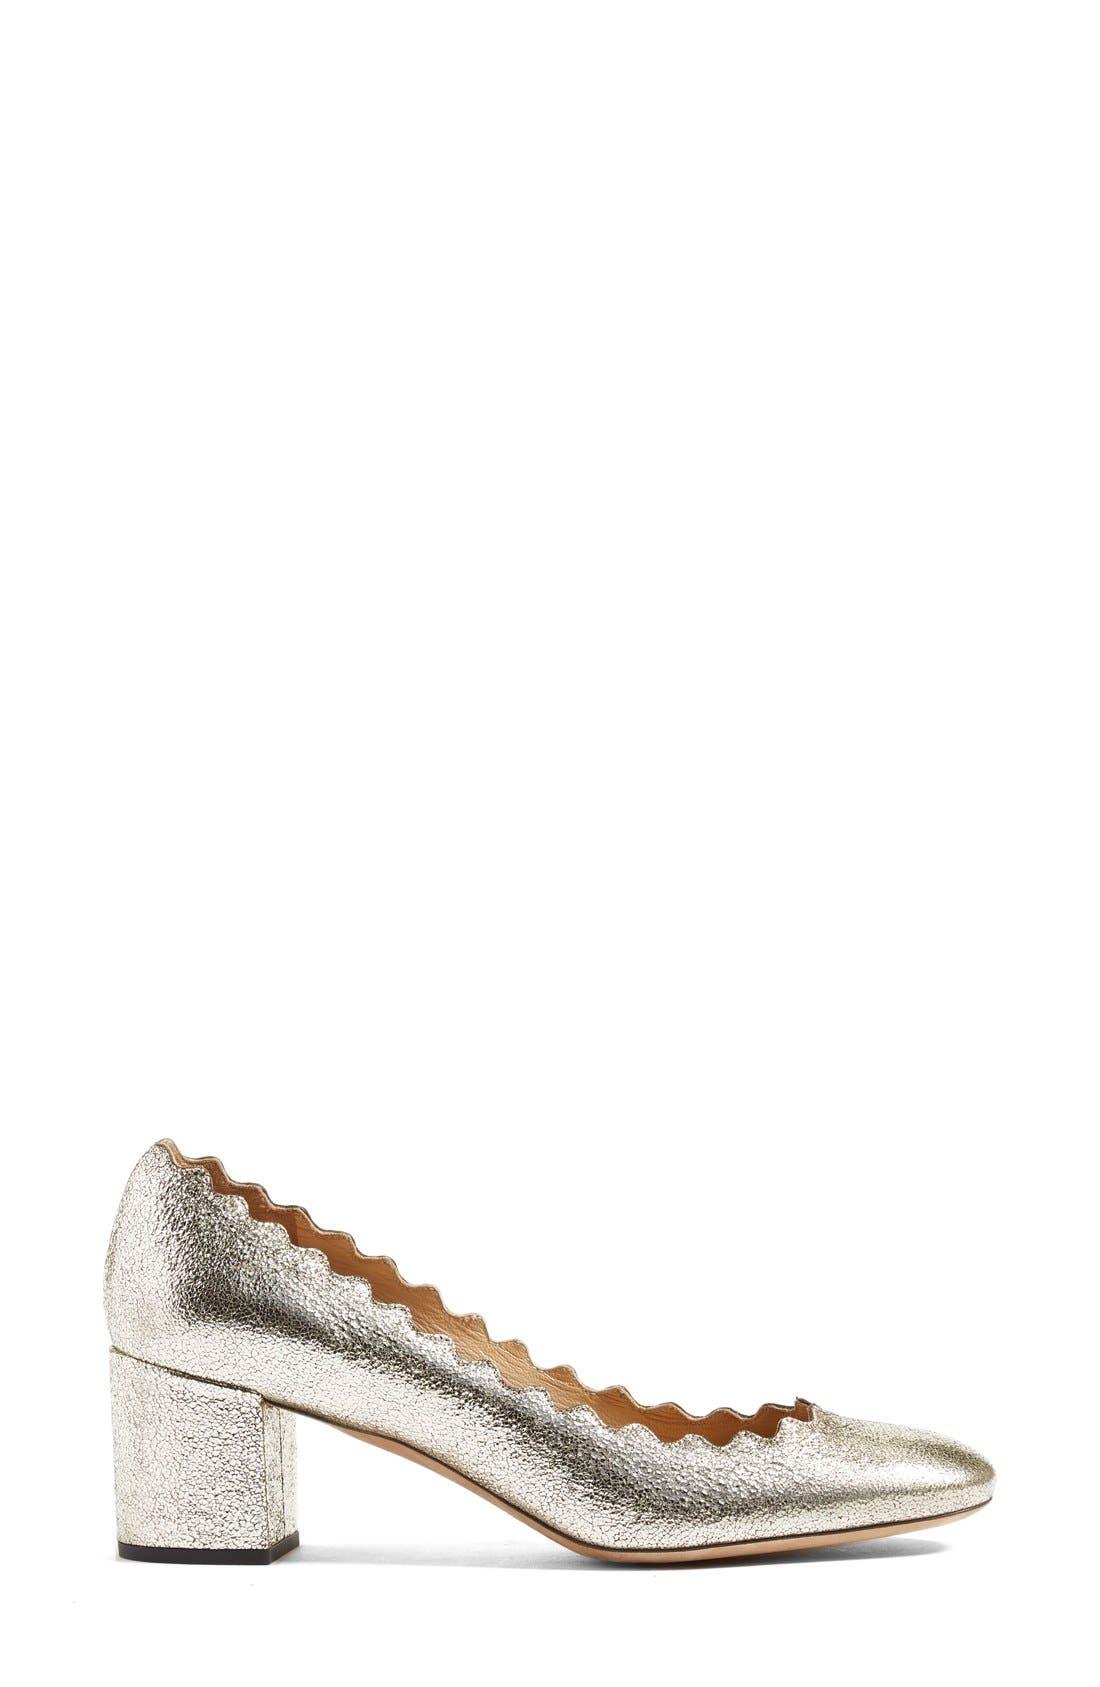 'Lauren' Scalloped Pump,                             Alternate thumbnail 4, color,                             Grey Glitter